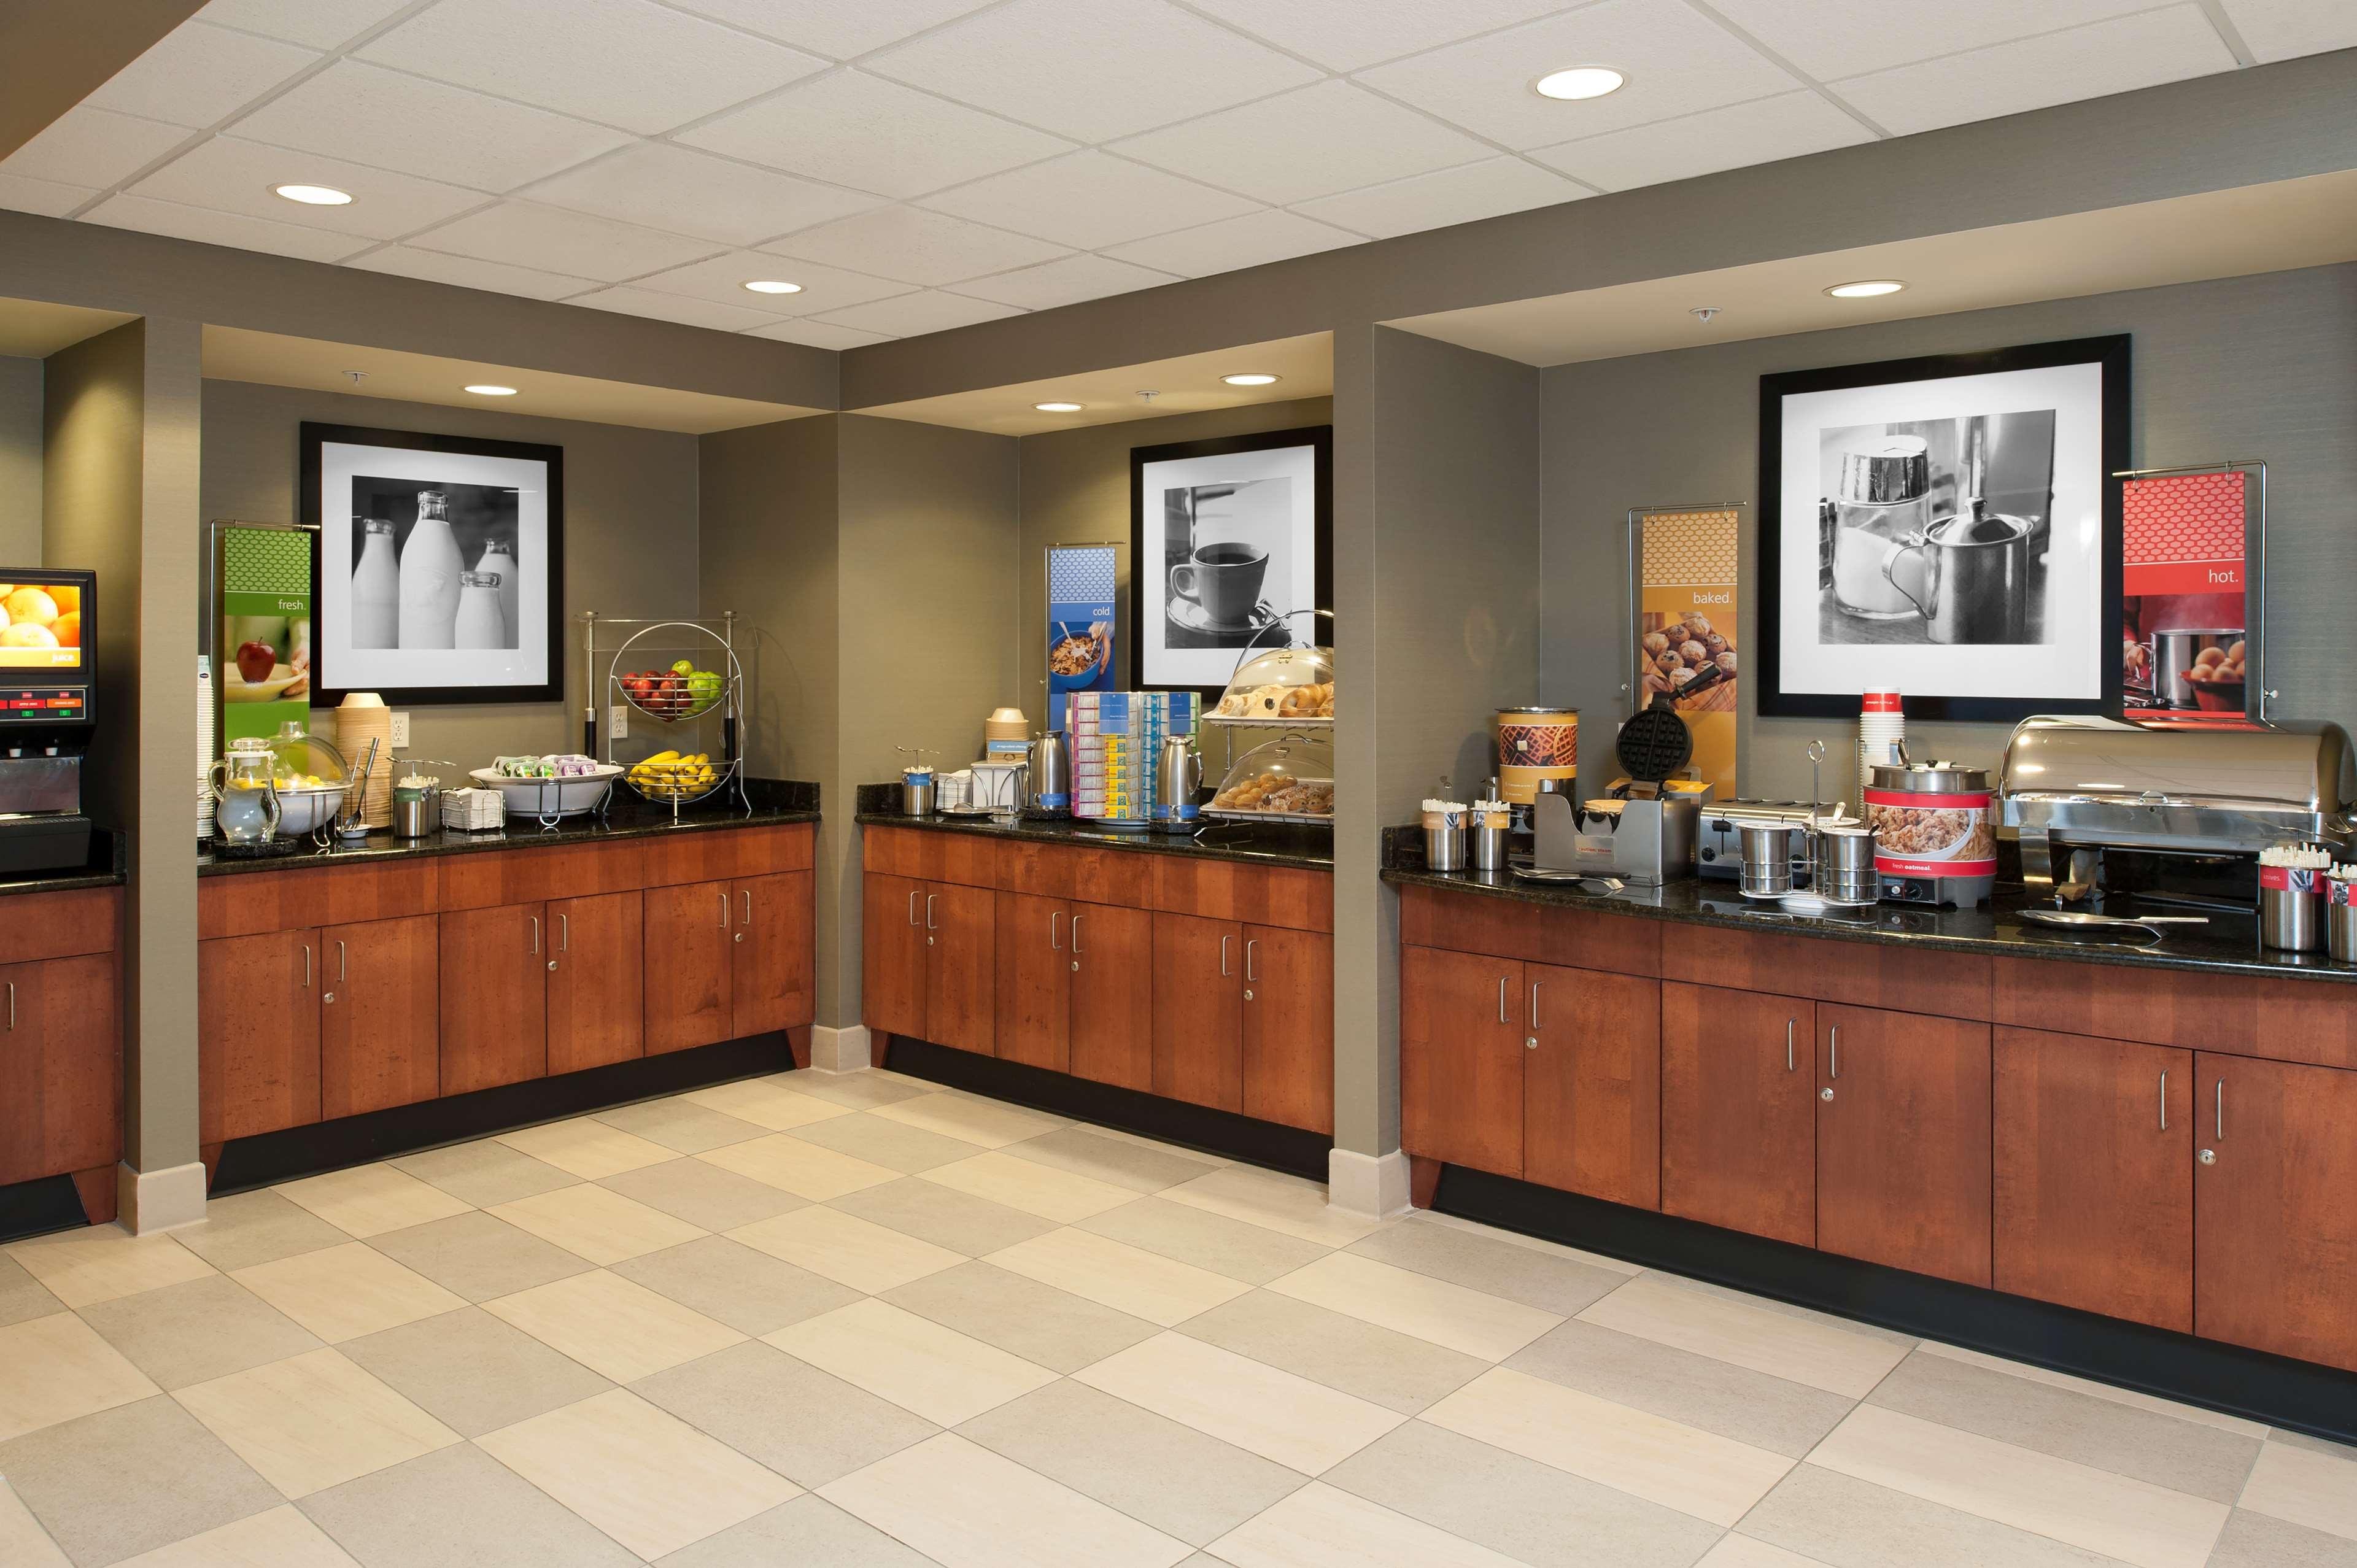 Hampton Inn & Suites Grand Rapids-Airport 28th St image 6